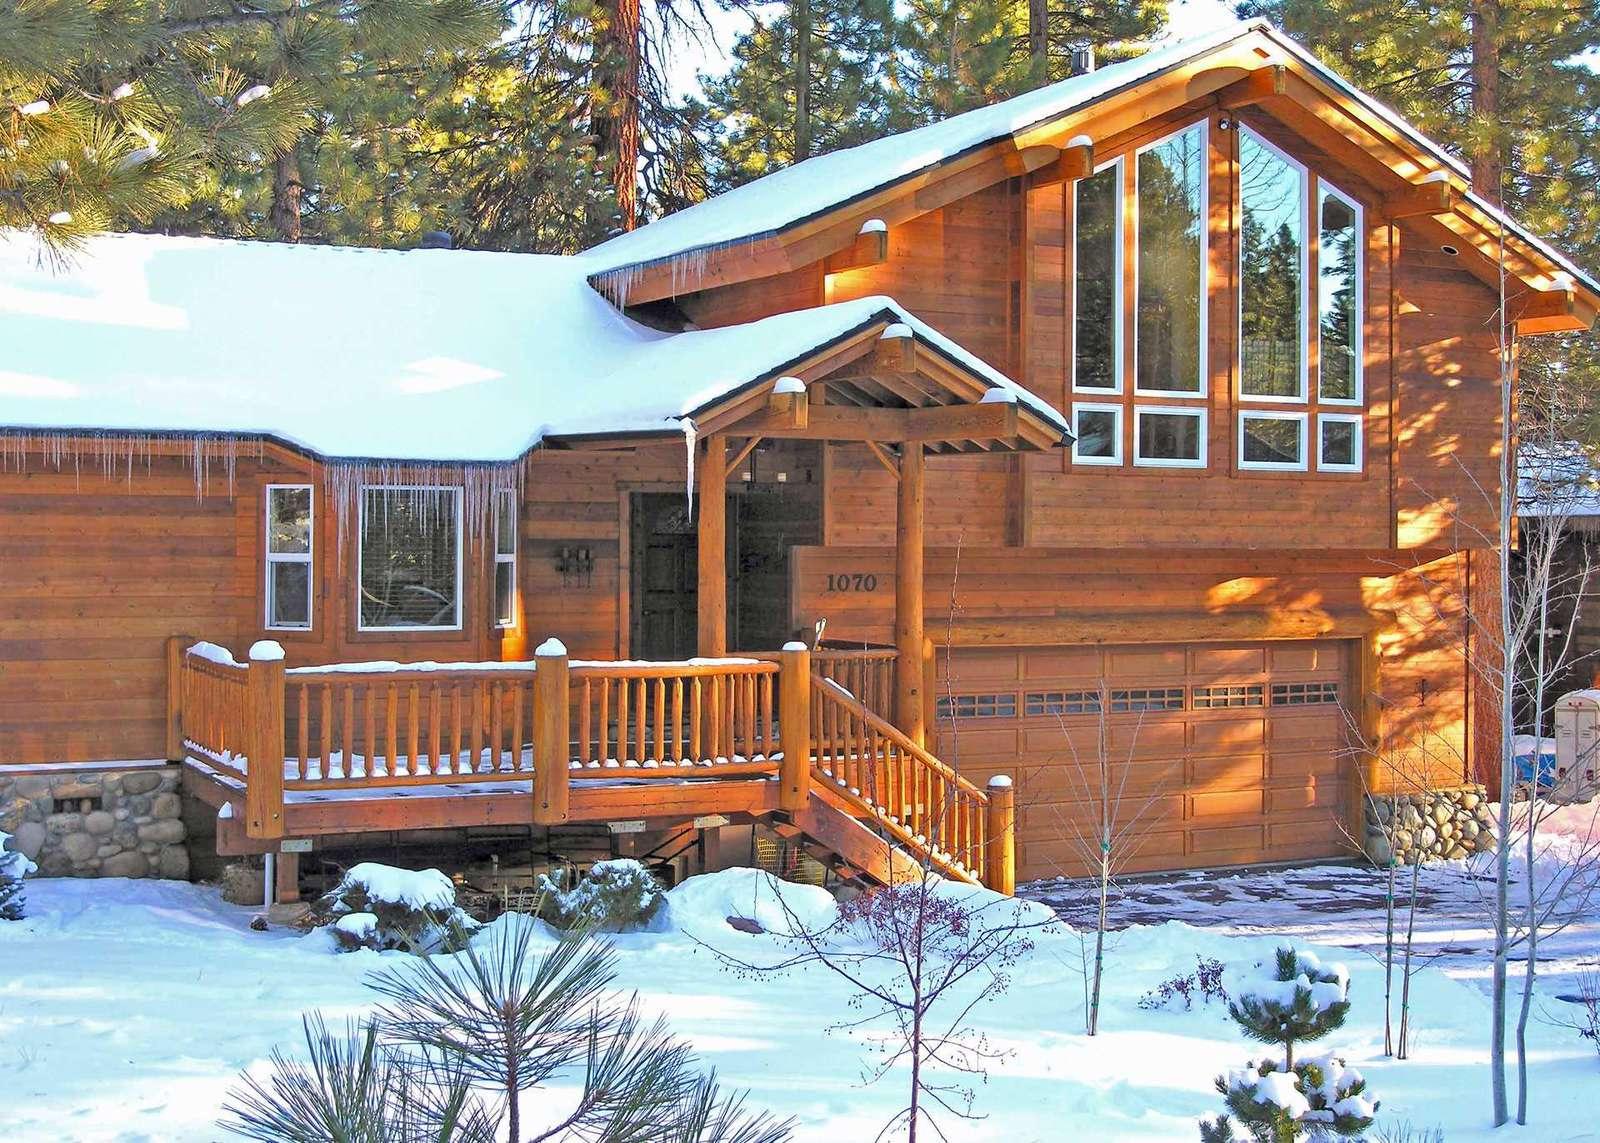 Snowed Inn - property